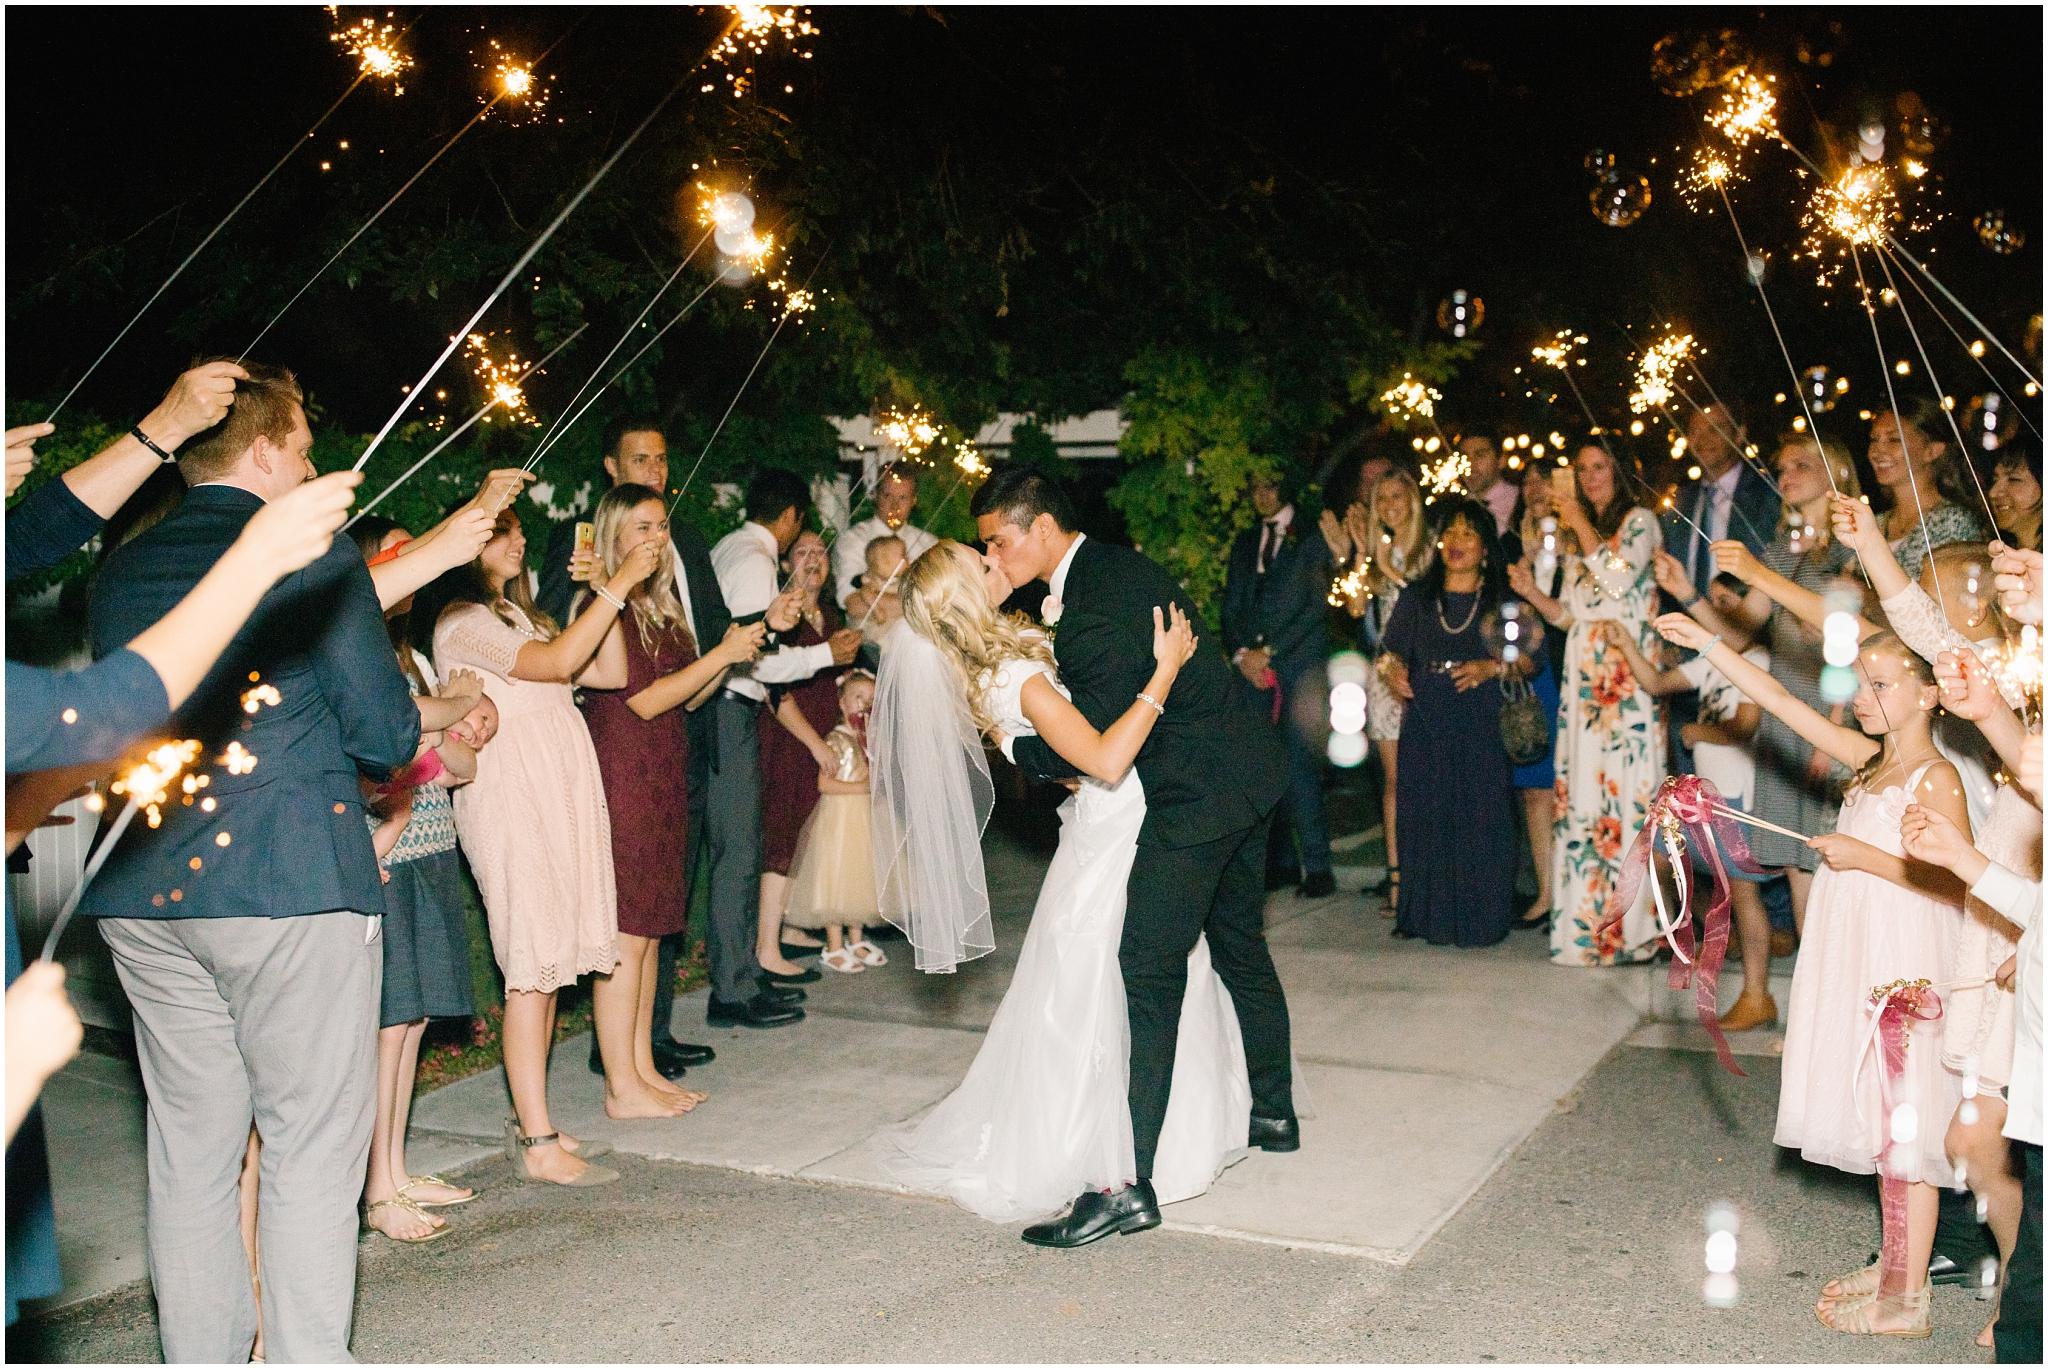 HannahChaseWedding-548_Lizzie-B-Imagery-Utah-Wedding-Photographer-Park-City-Salt-Lake-City-Payson-Temple-Clarion-Garden-Center.jpg